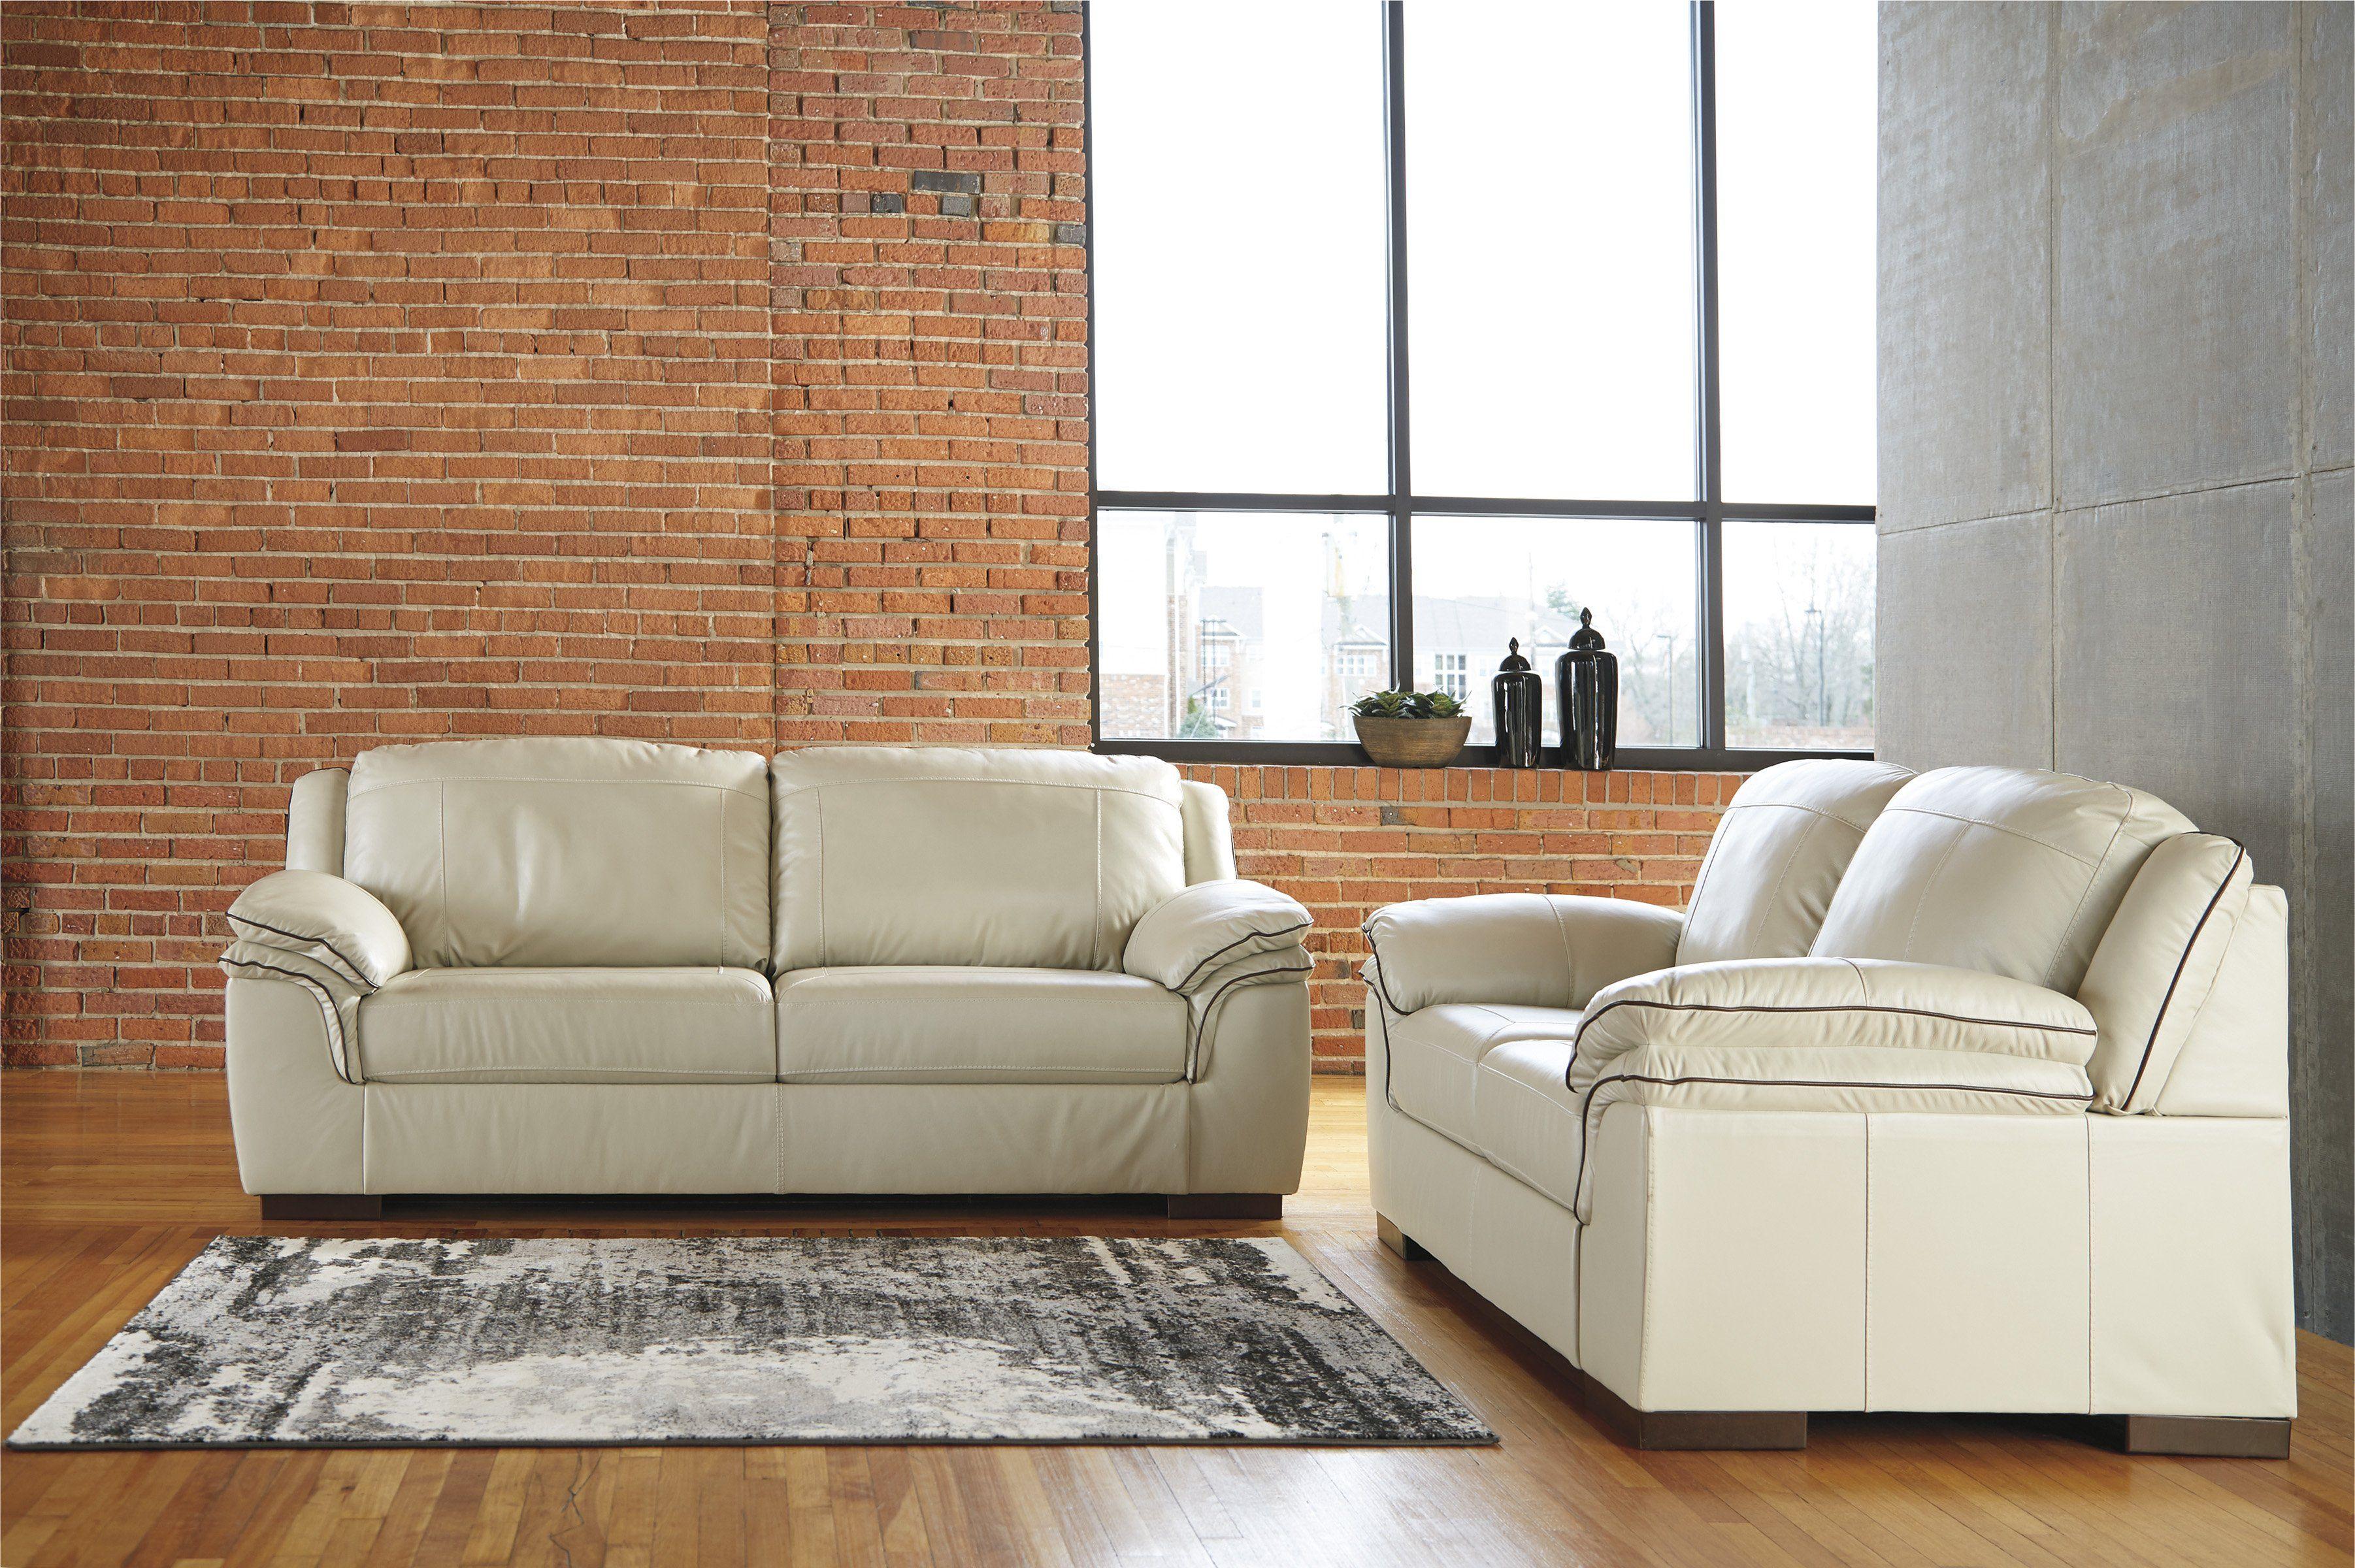 Islebrook Sofa And Loveseat Sofa Upholstered Sofa Love